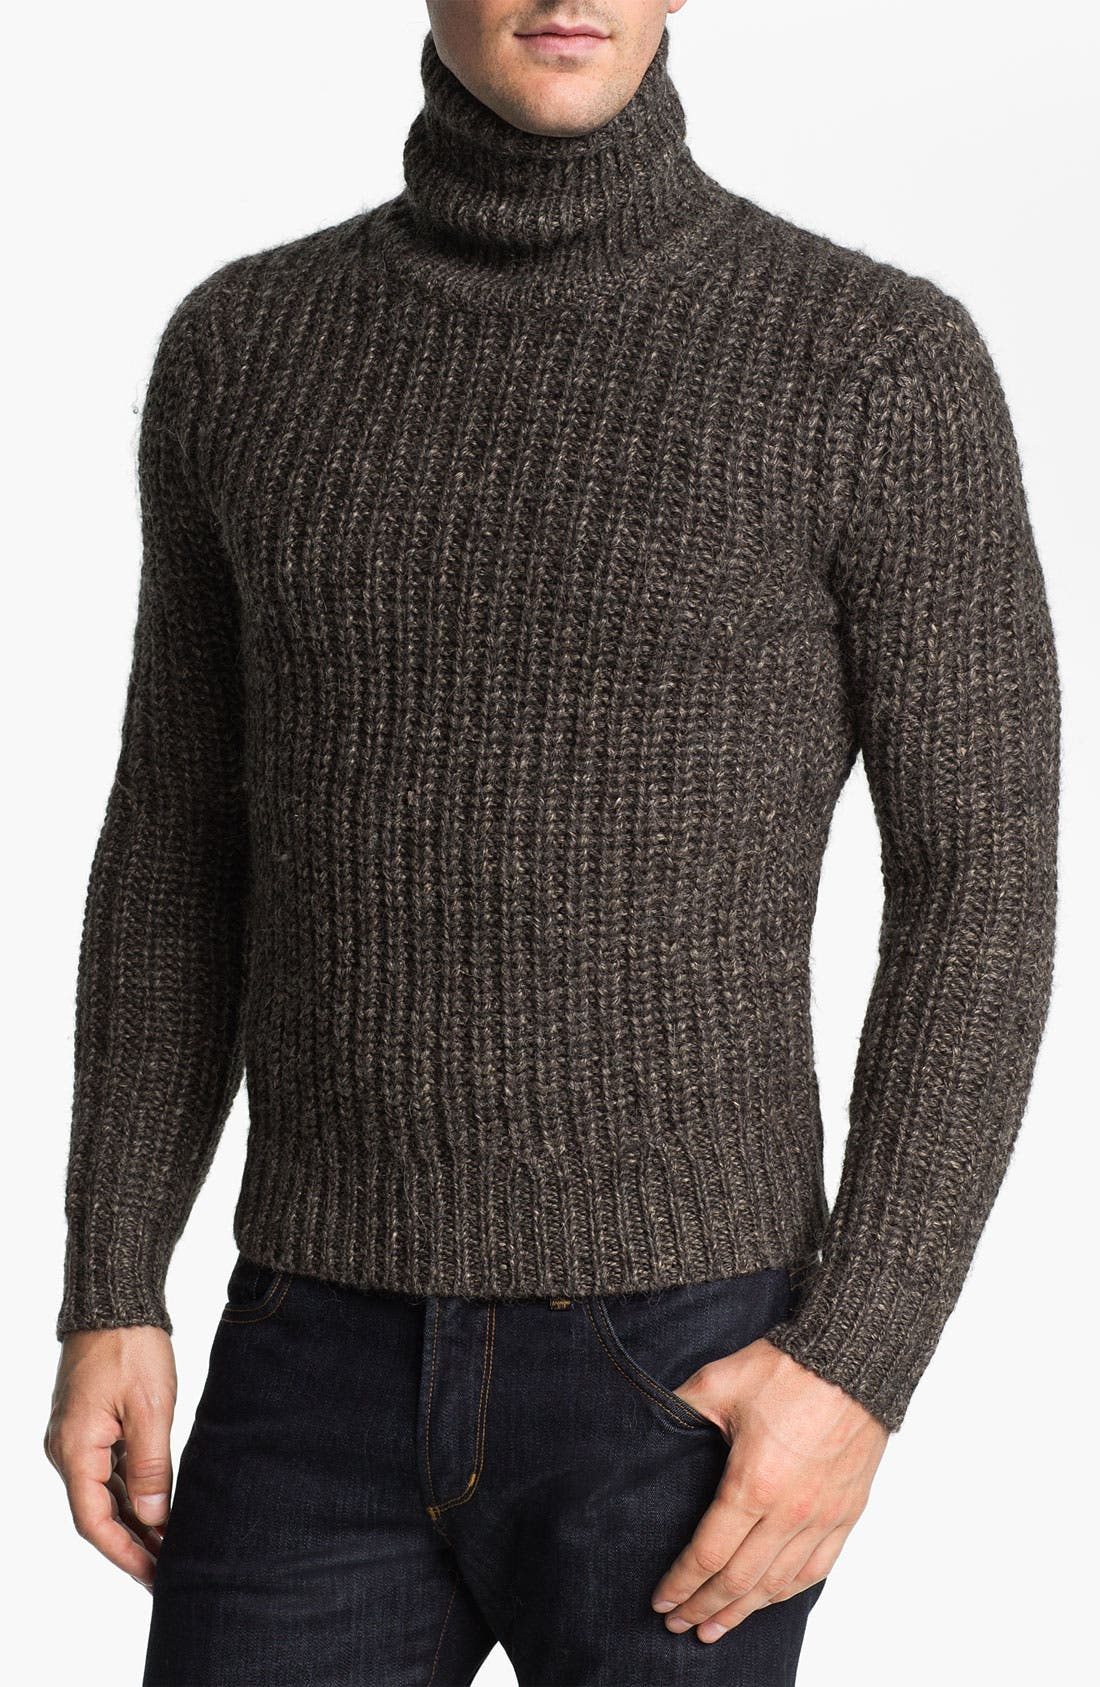 MICHAEL KORS,                             Alpaca Blend Turtleneck Sweater,                             Main thumbnail 1, color,                             029